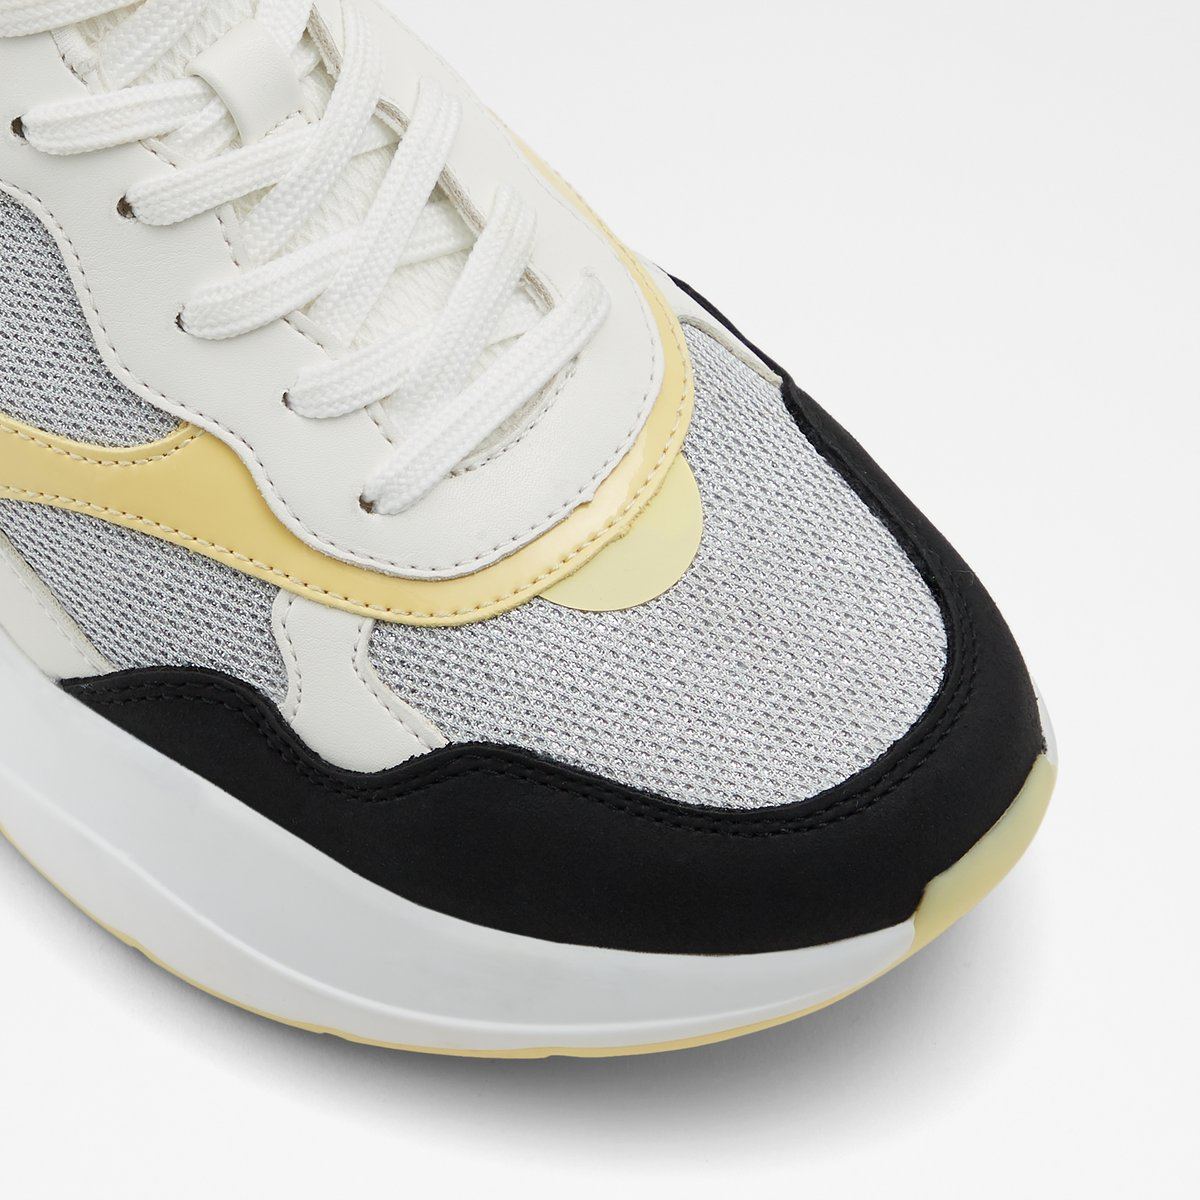 ef04c63ecd76 Merurka Light Yellow Women s Sneakers